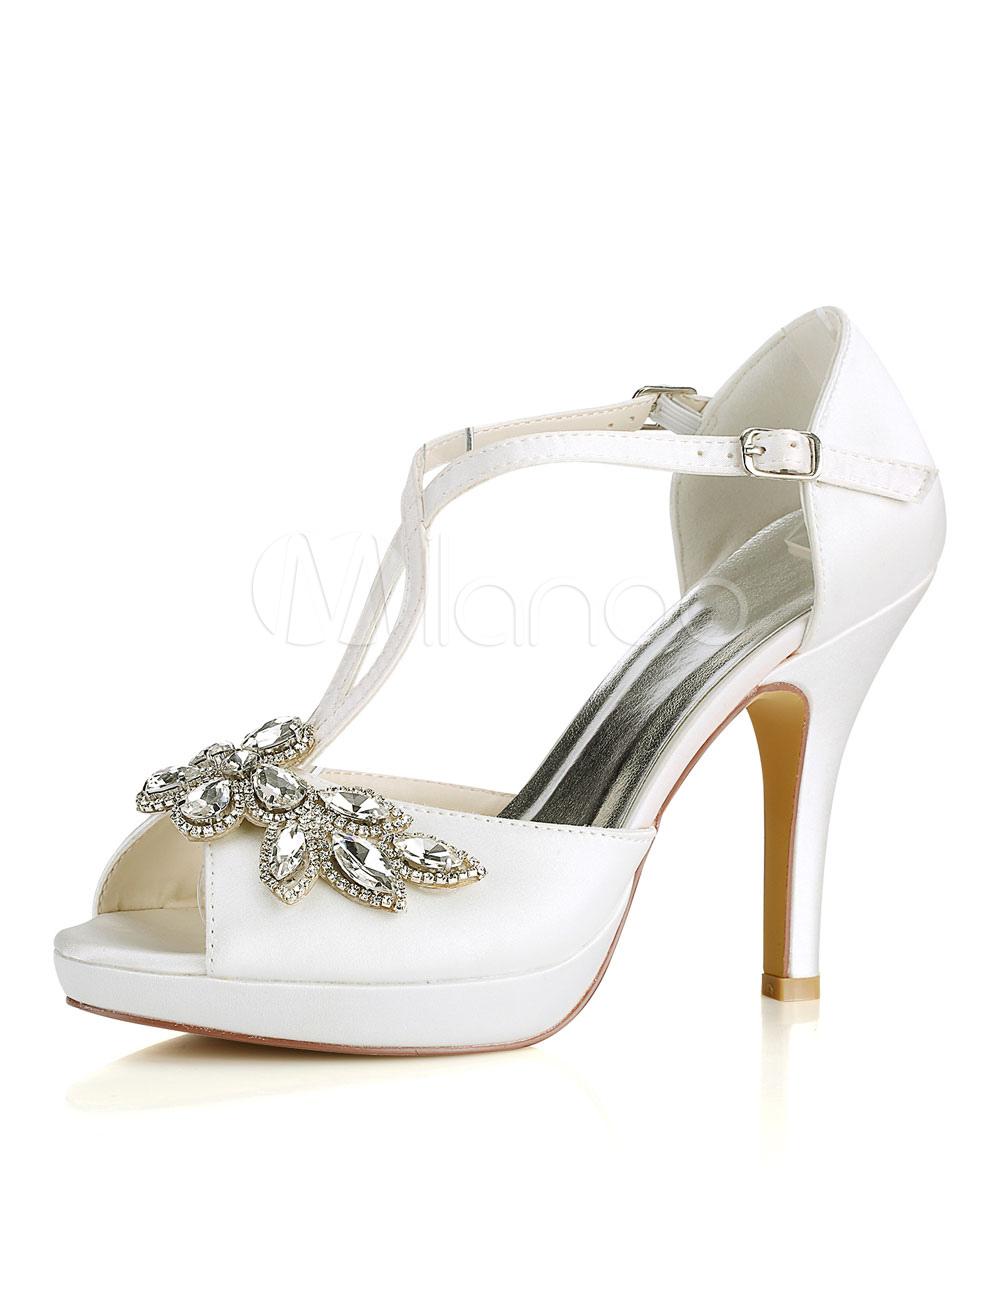 Ivory Wedding Shoes Peep Toe Rhinestones Criss Cross Bridal Shoes High Heel Sandals